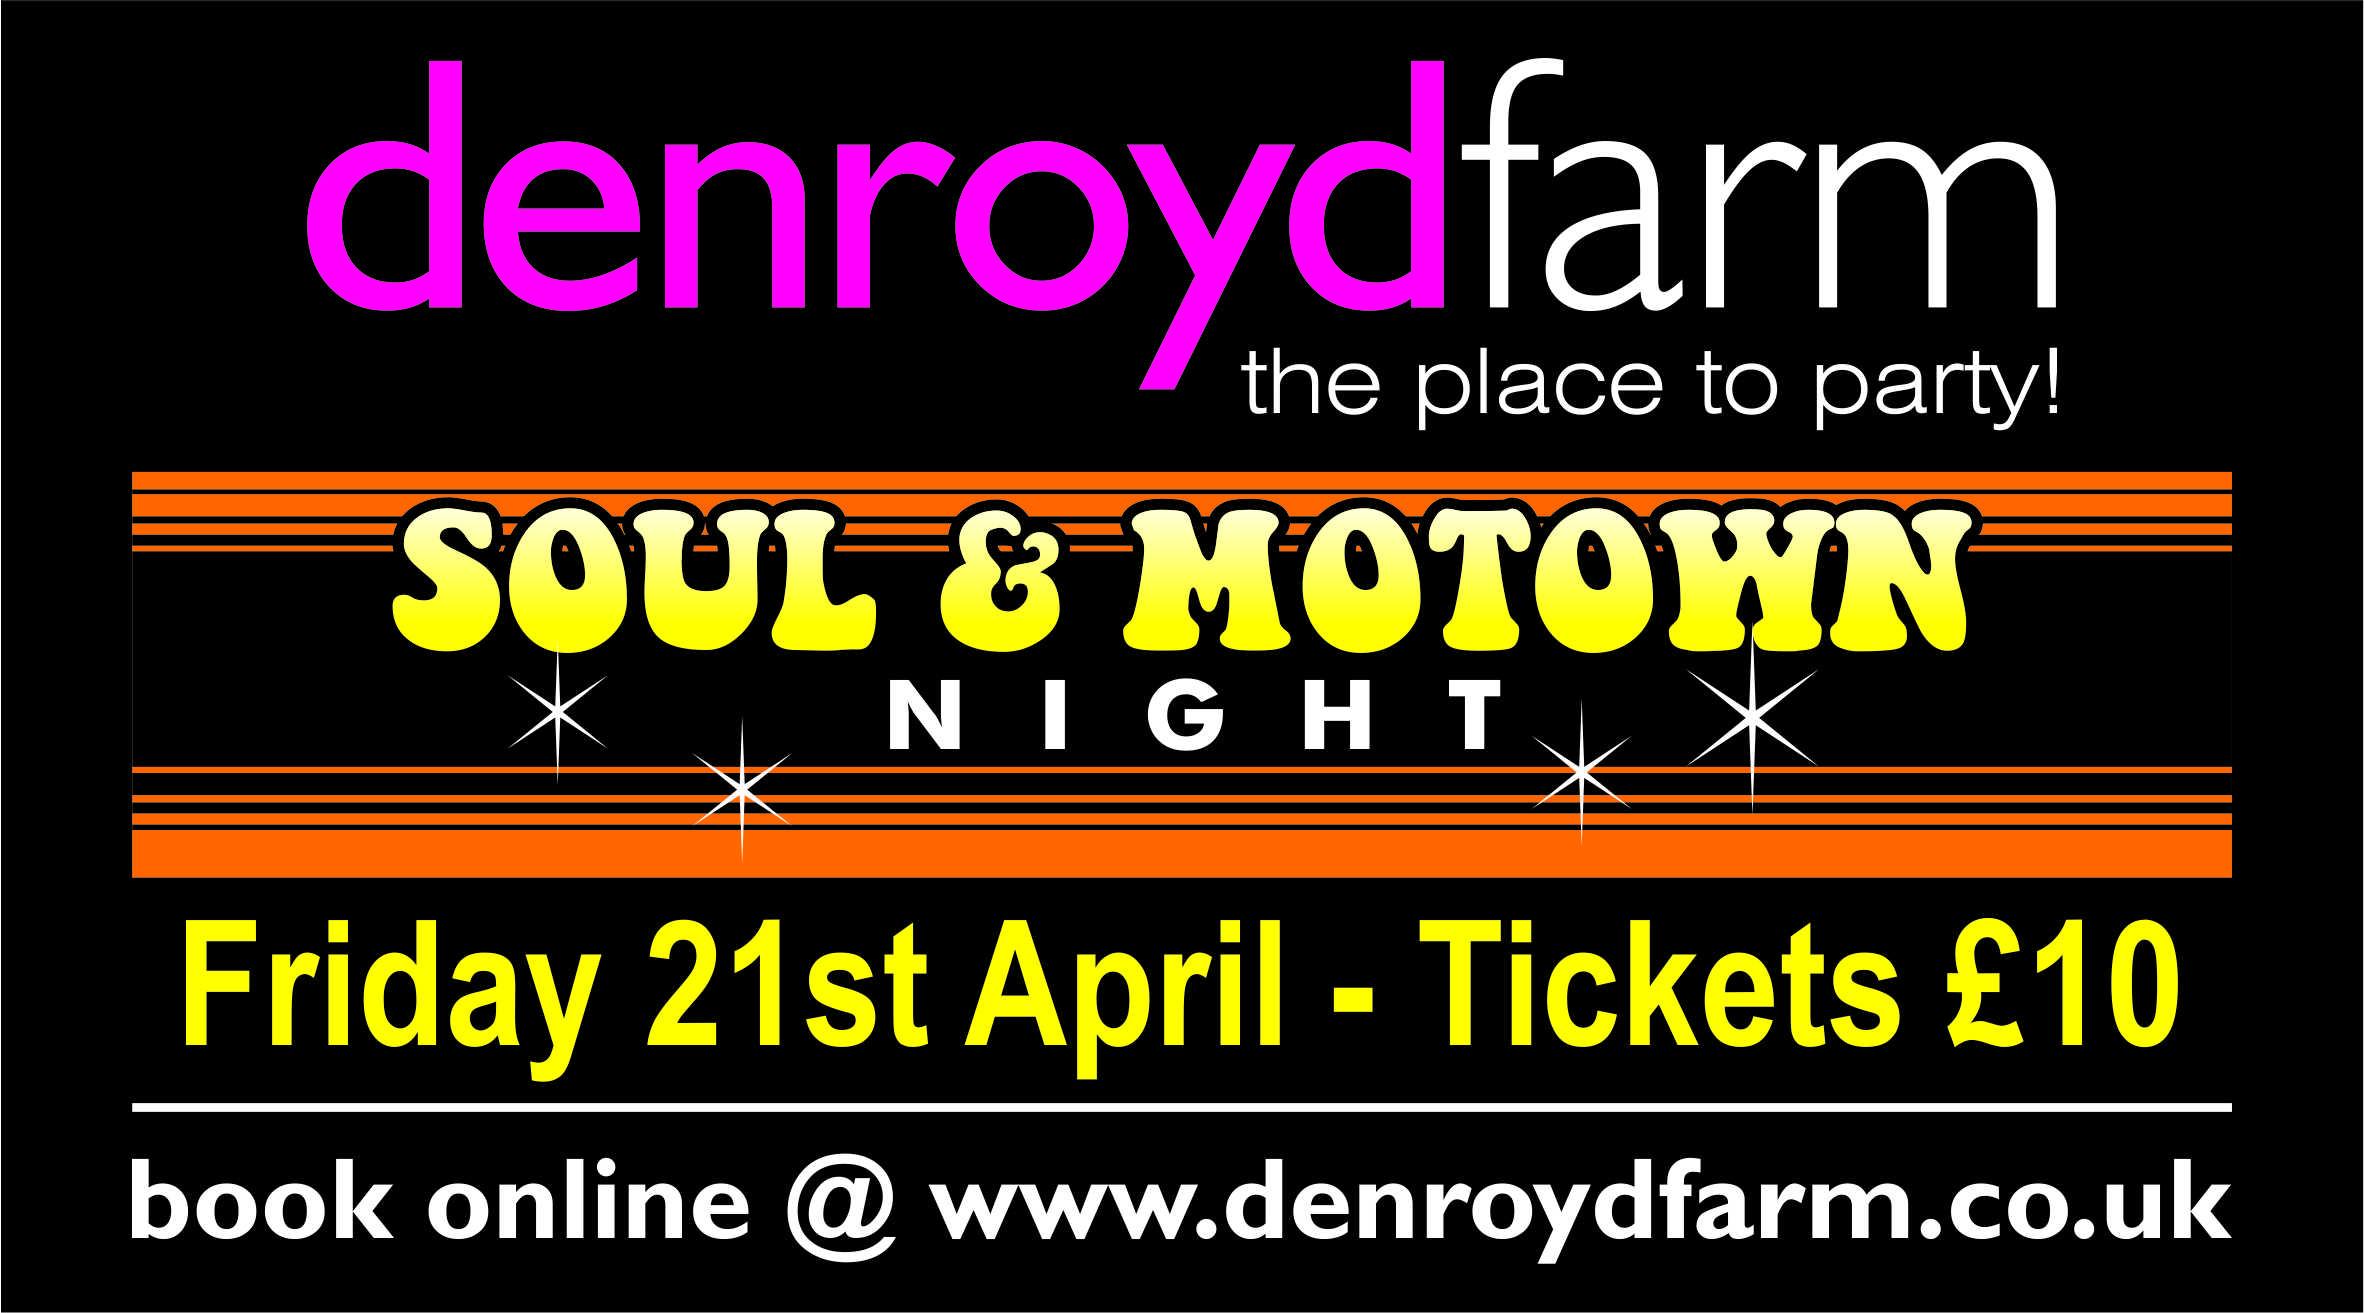 Denroyd Farm soul motown